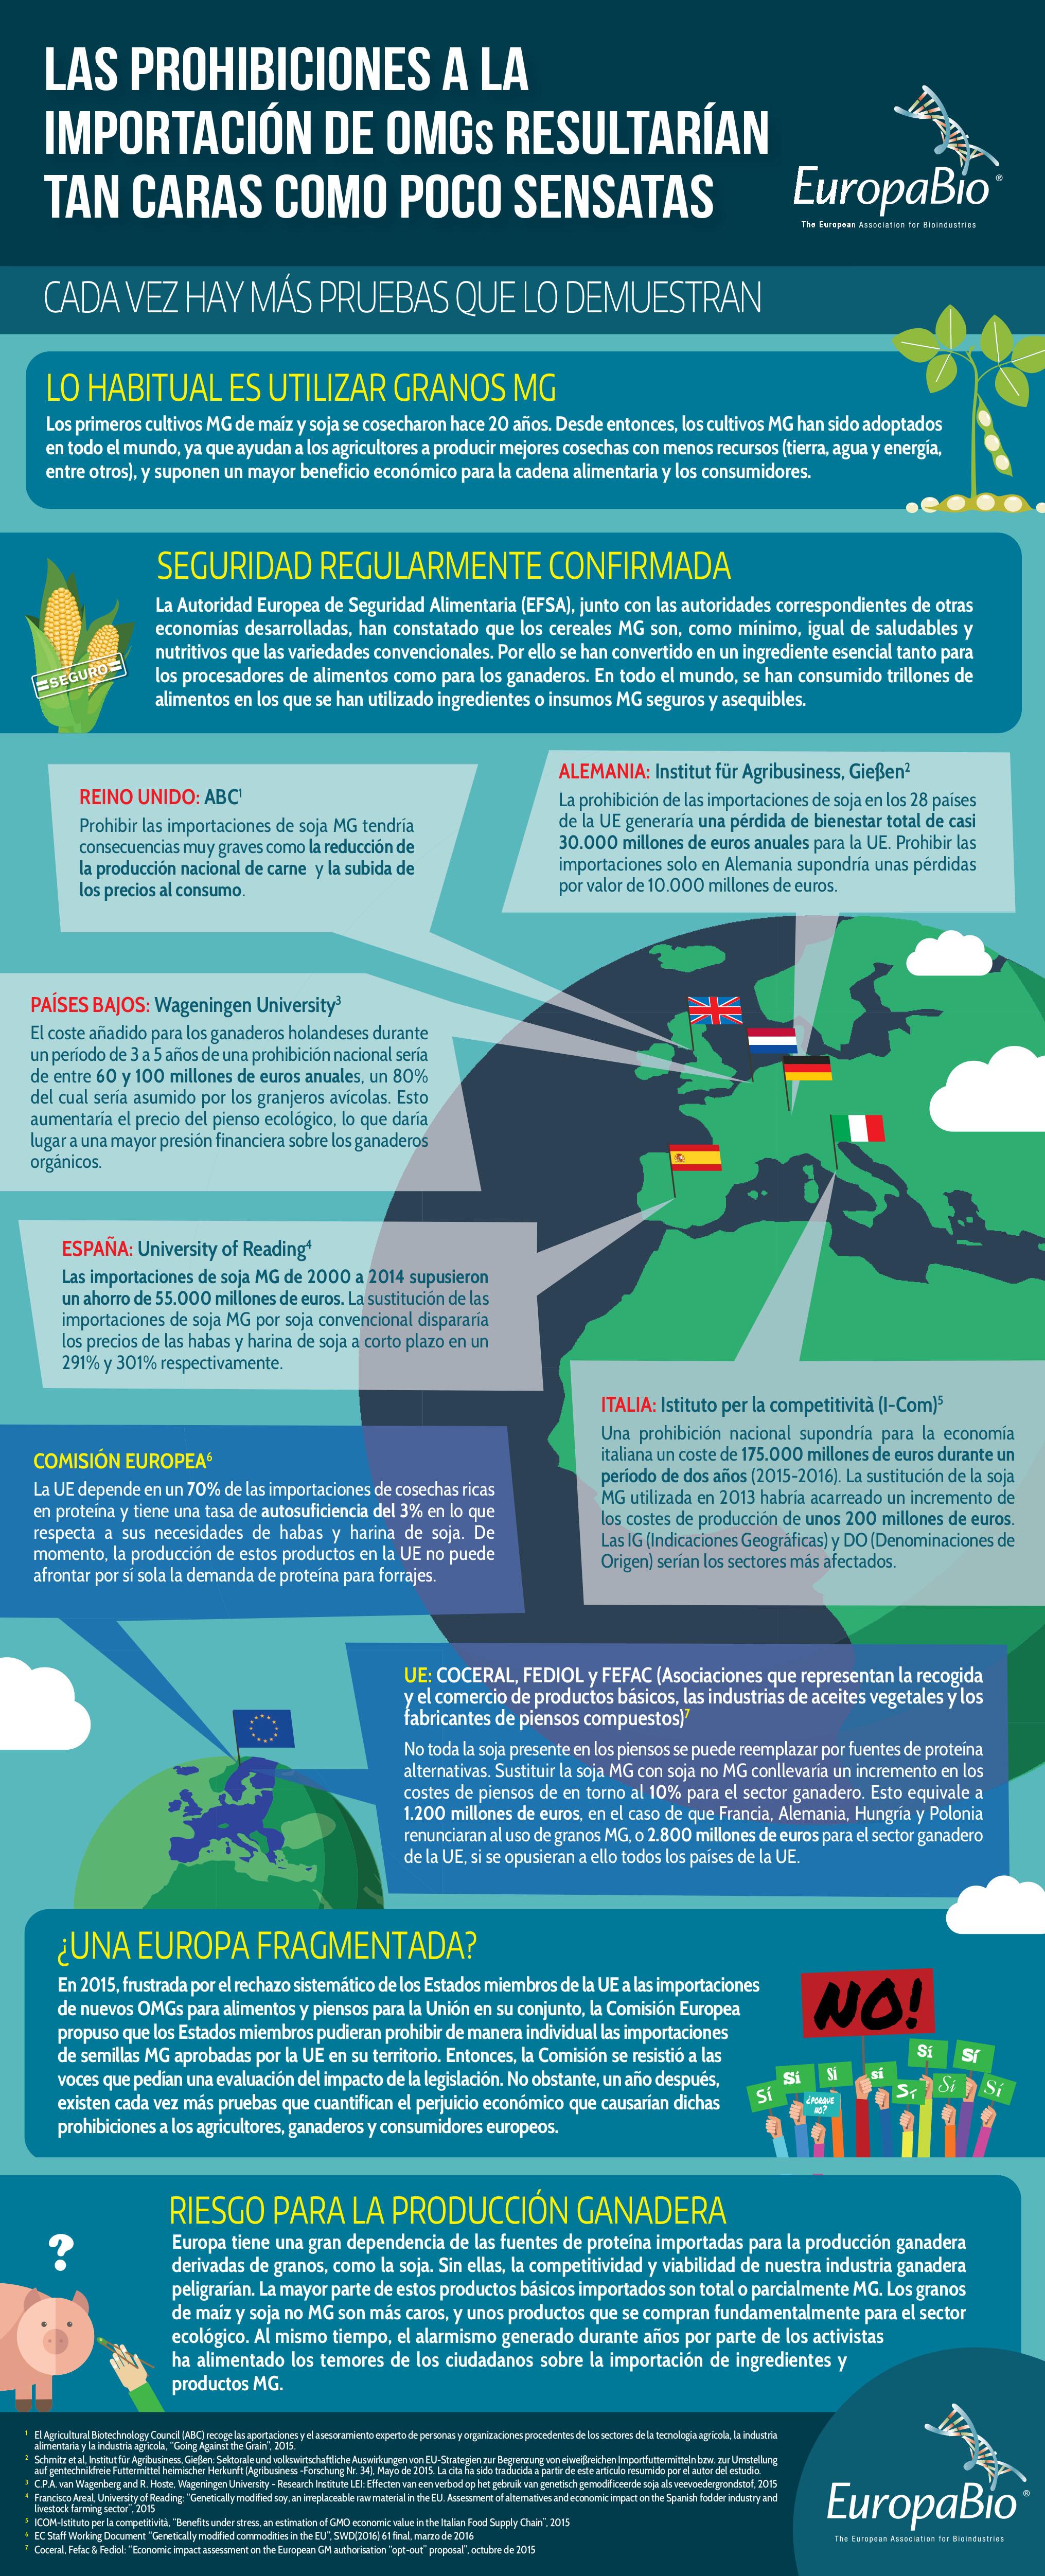 INFOGRAPHIC_GMO_BAN_ES_v2_Drieluik_Infographic_Europabio